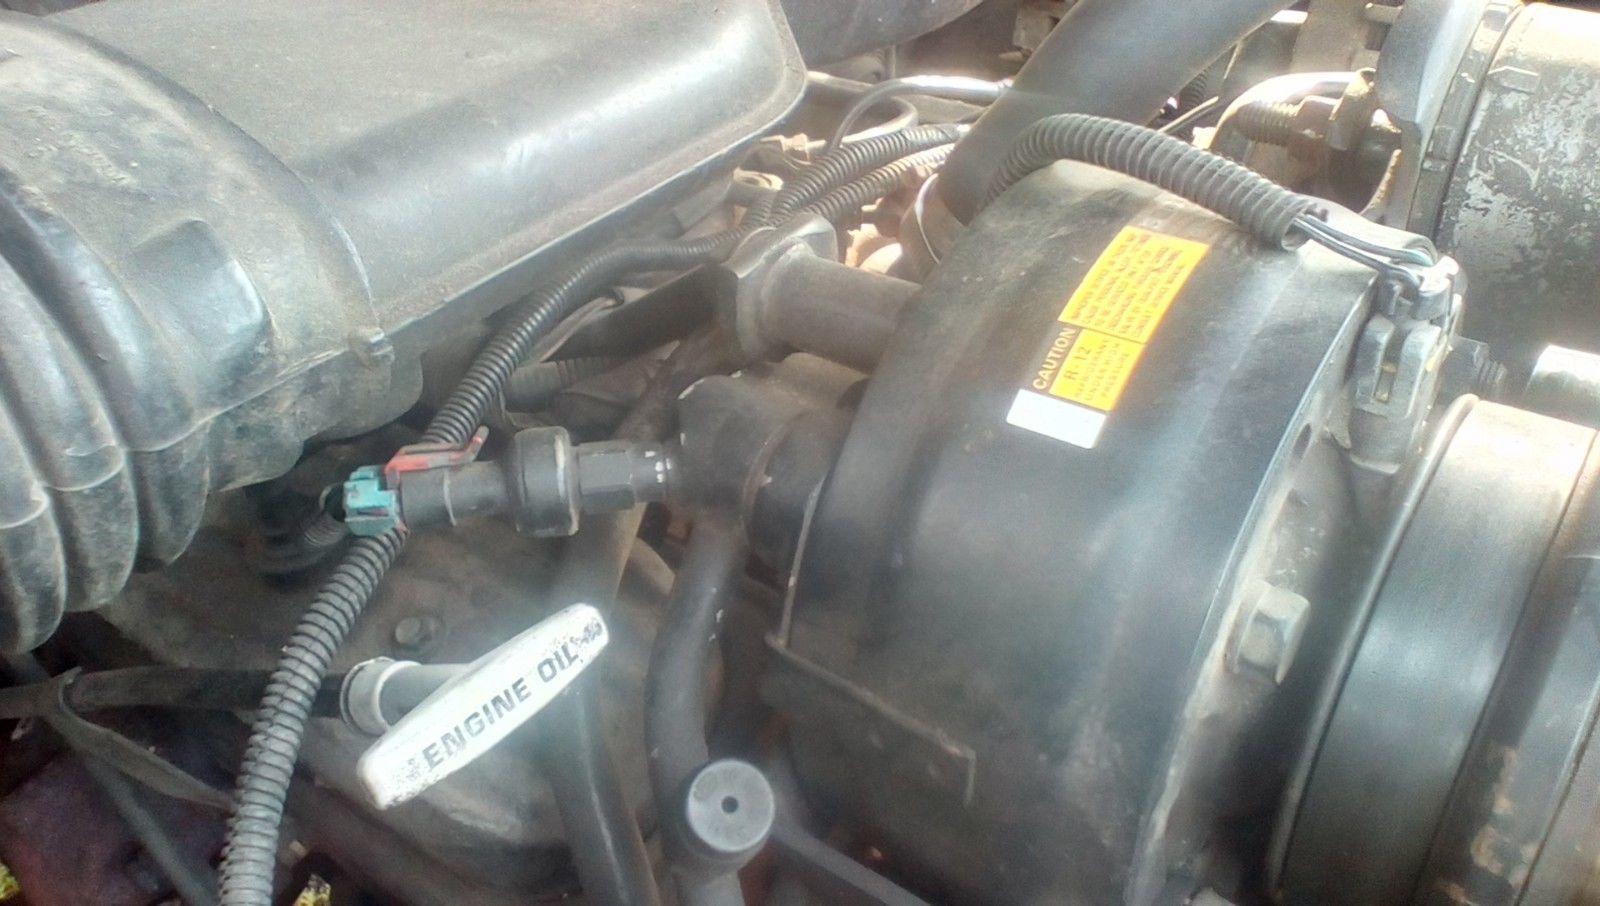 88/98 Chevy Silverado Truck A/C Compressor and 36 similar items